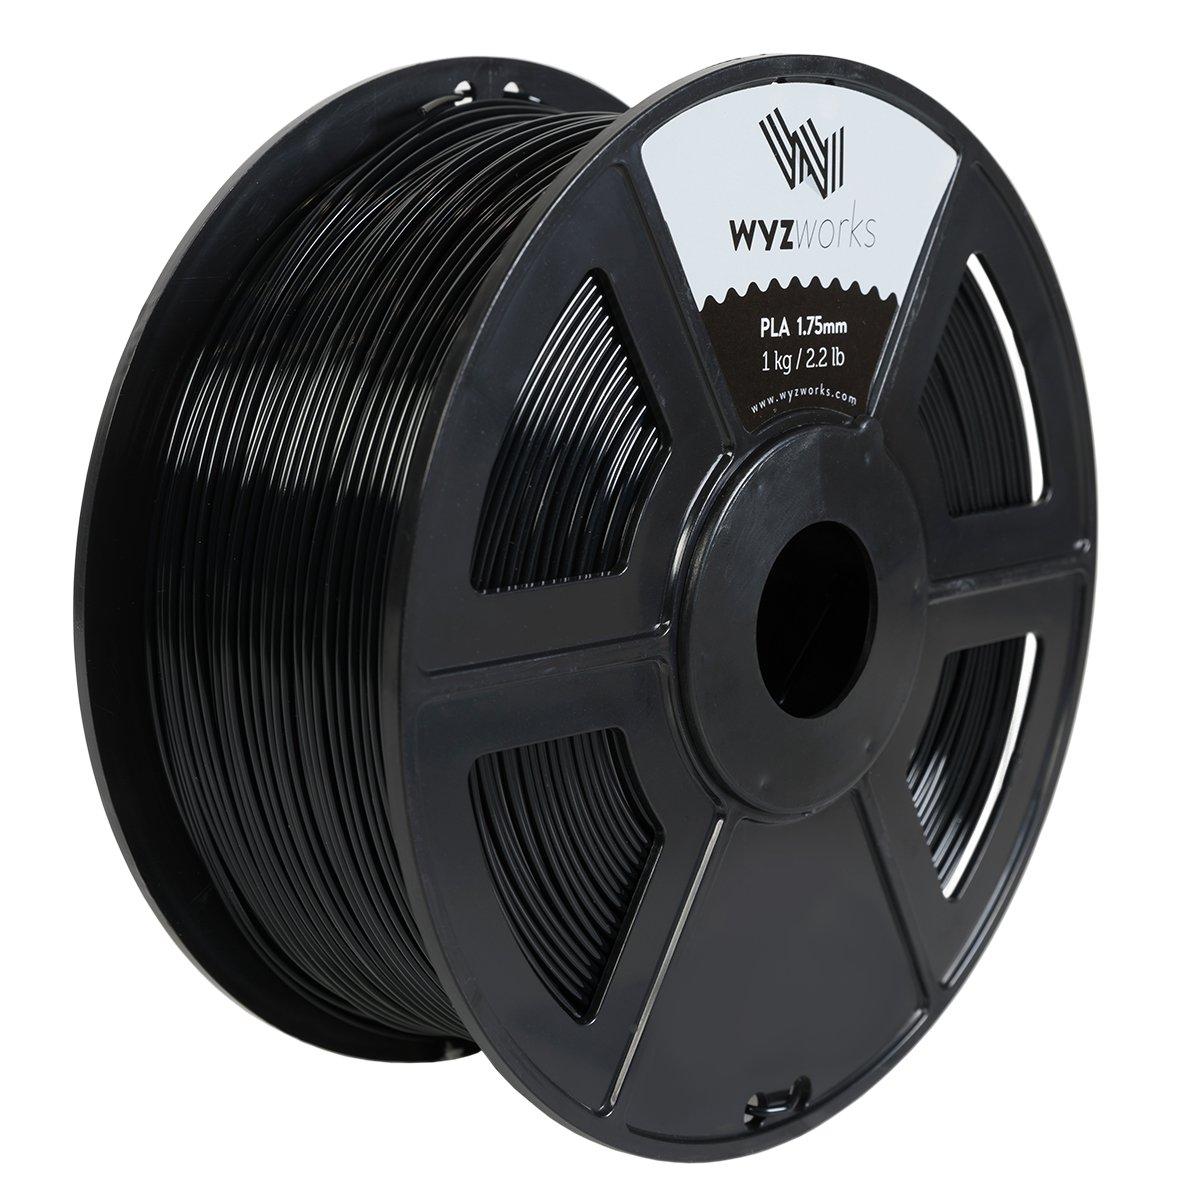 WYZworks - Filamento de impresora 3D de 1,75 mm, calidad superior ...